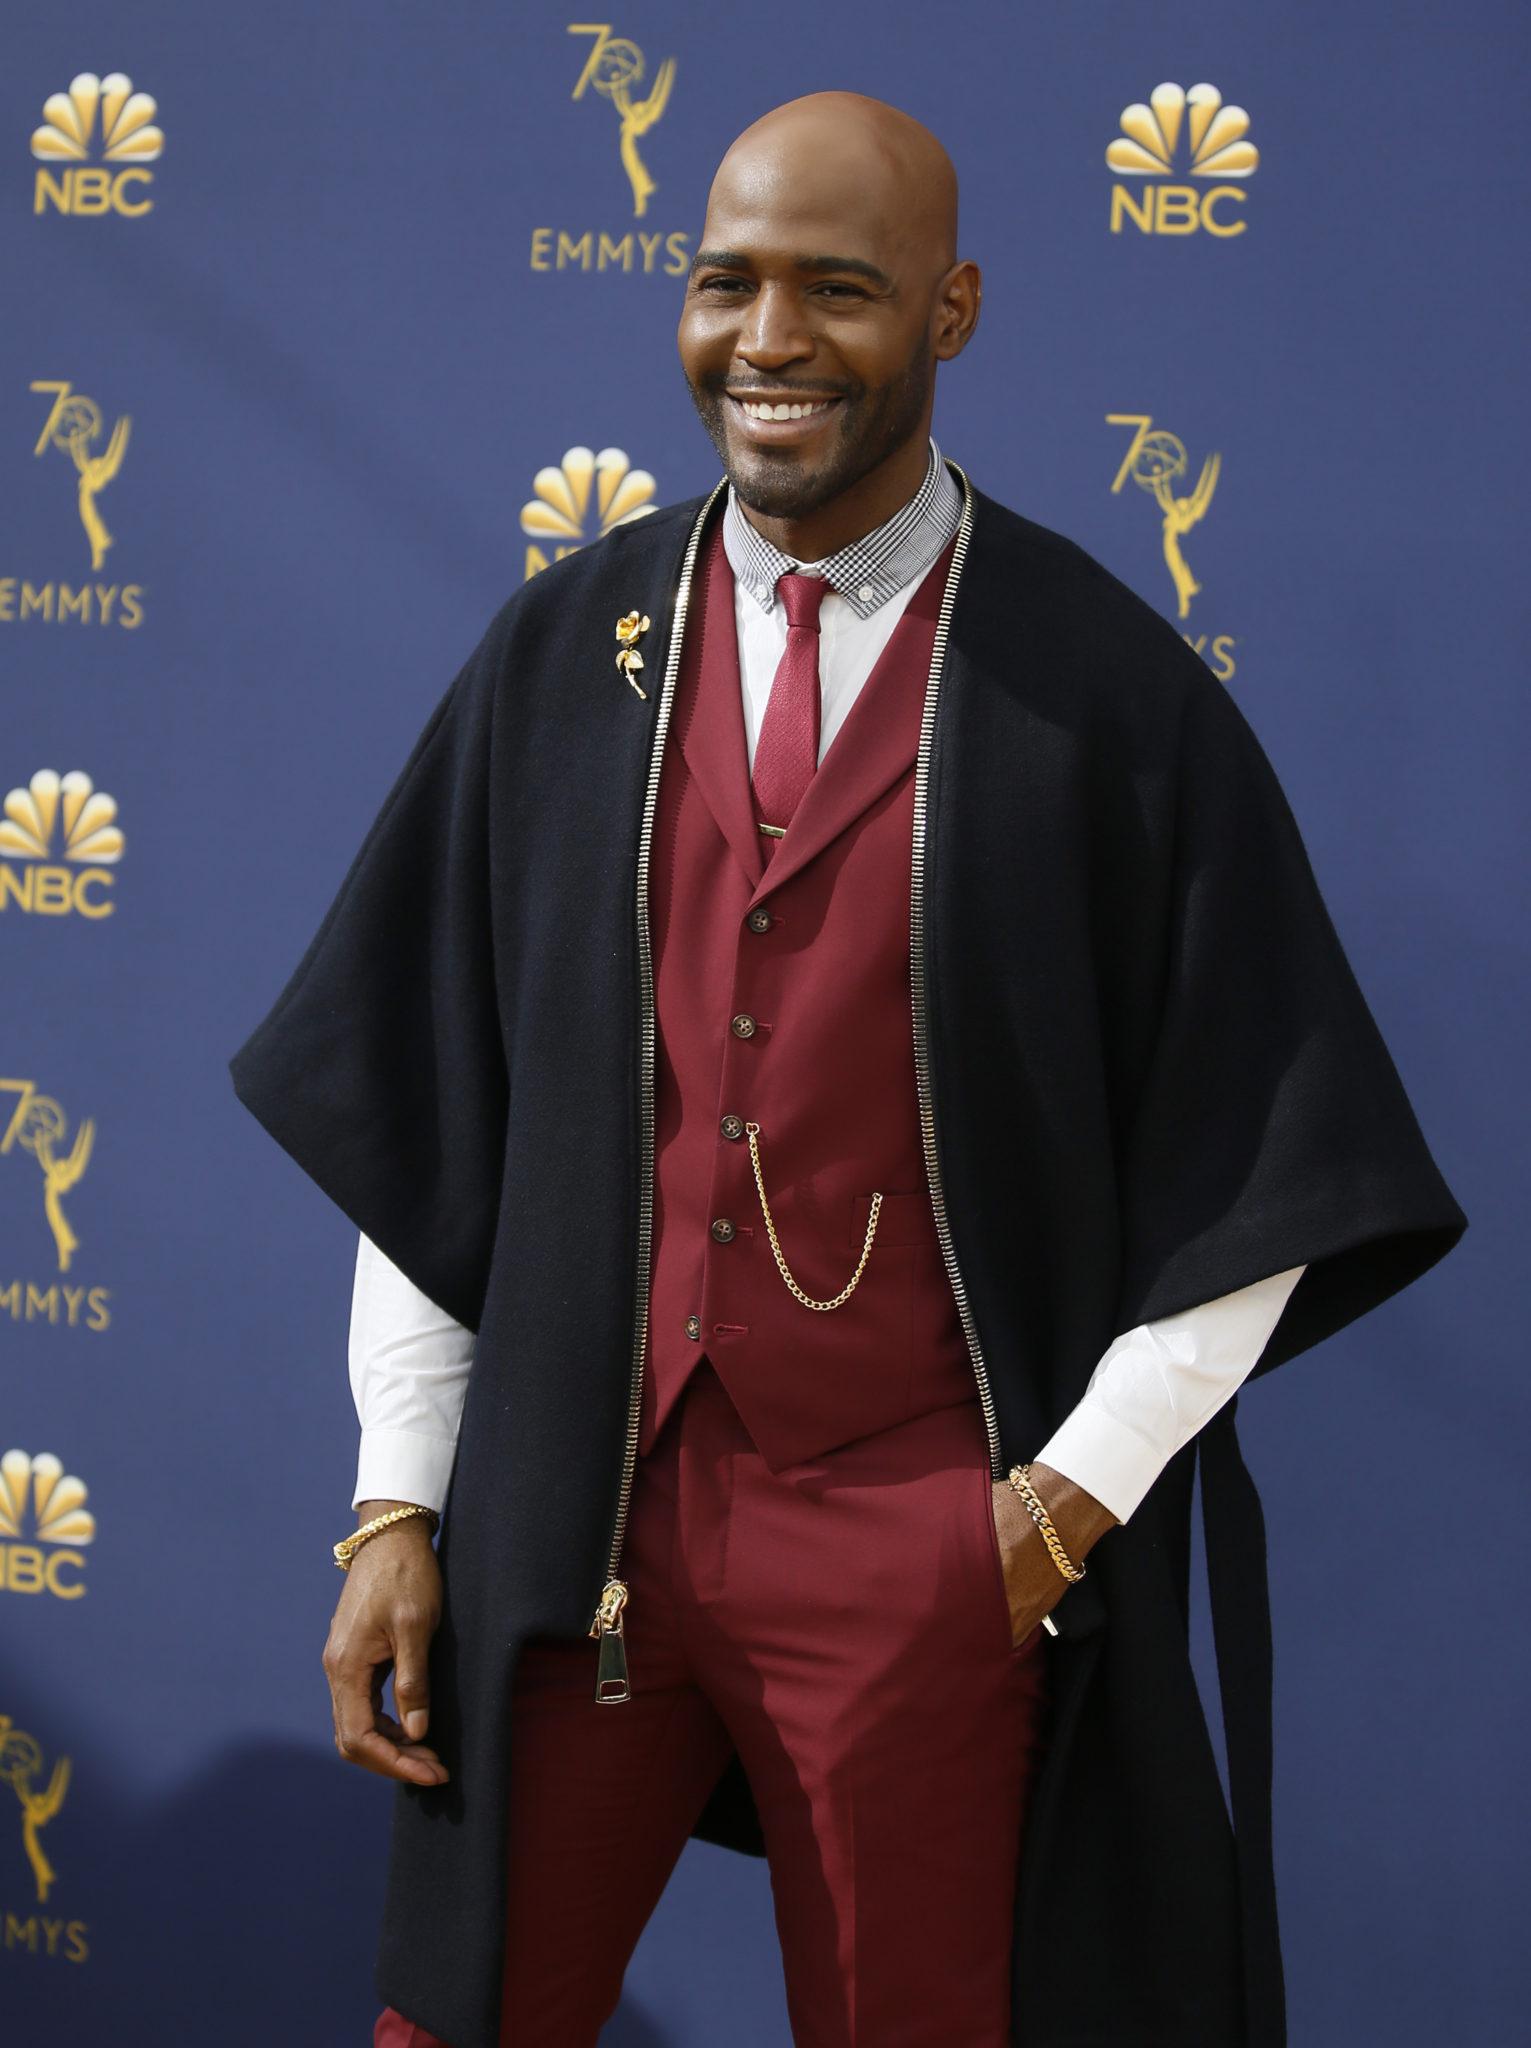 Karamo Brown Emmys 4Chion Lifestyle